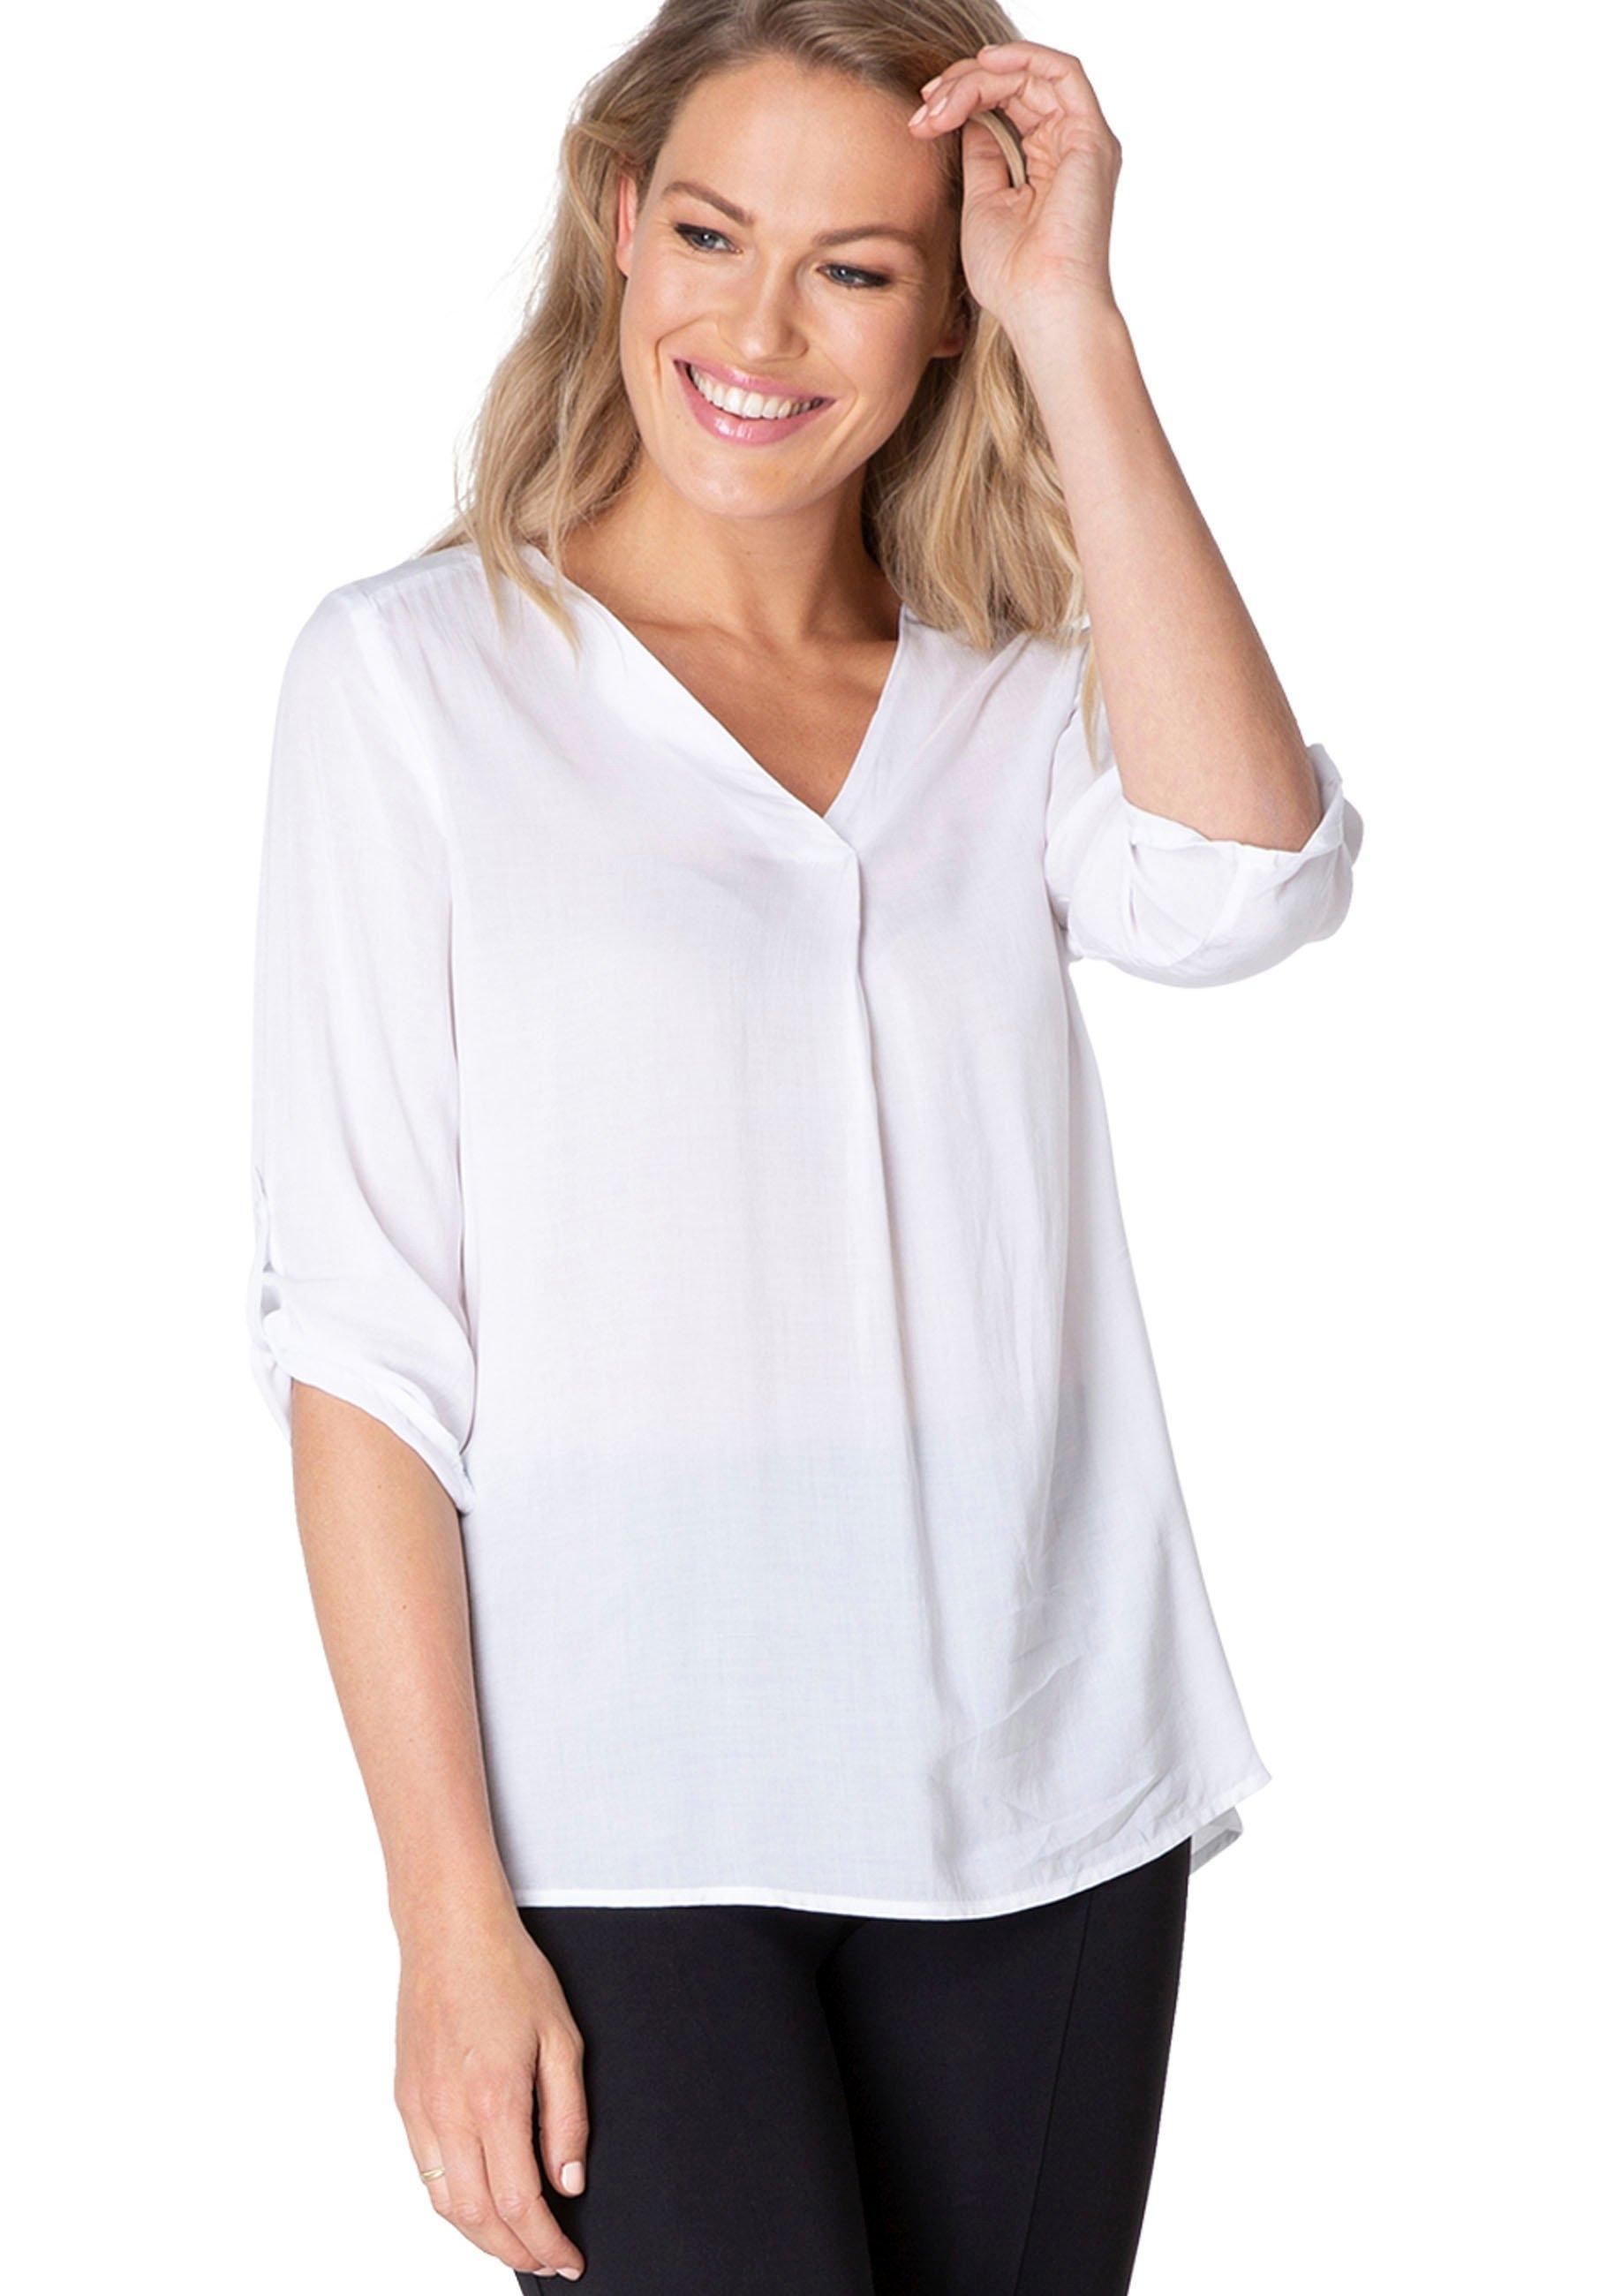 BSIC by Yest blouse zonder sluiting Yill Ruimvallend model in soepelvallende viscosekwaliteit goedkoop op otto.nl kopen